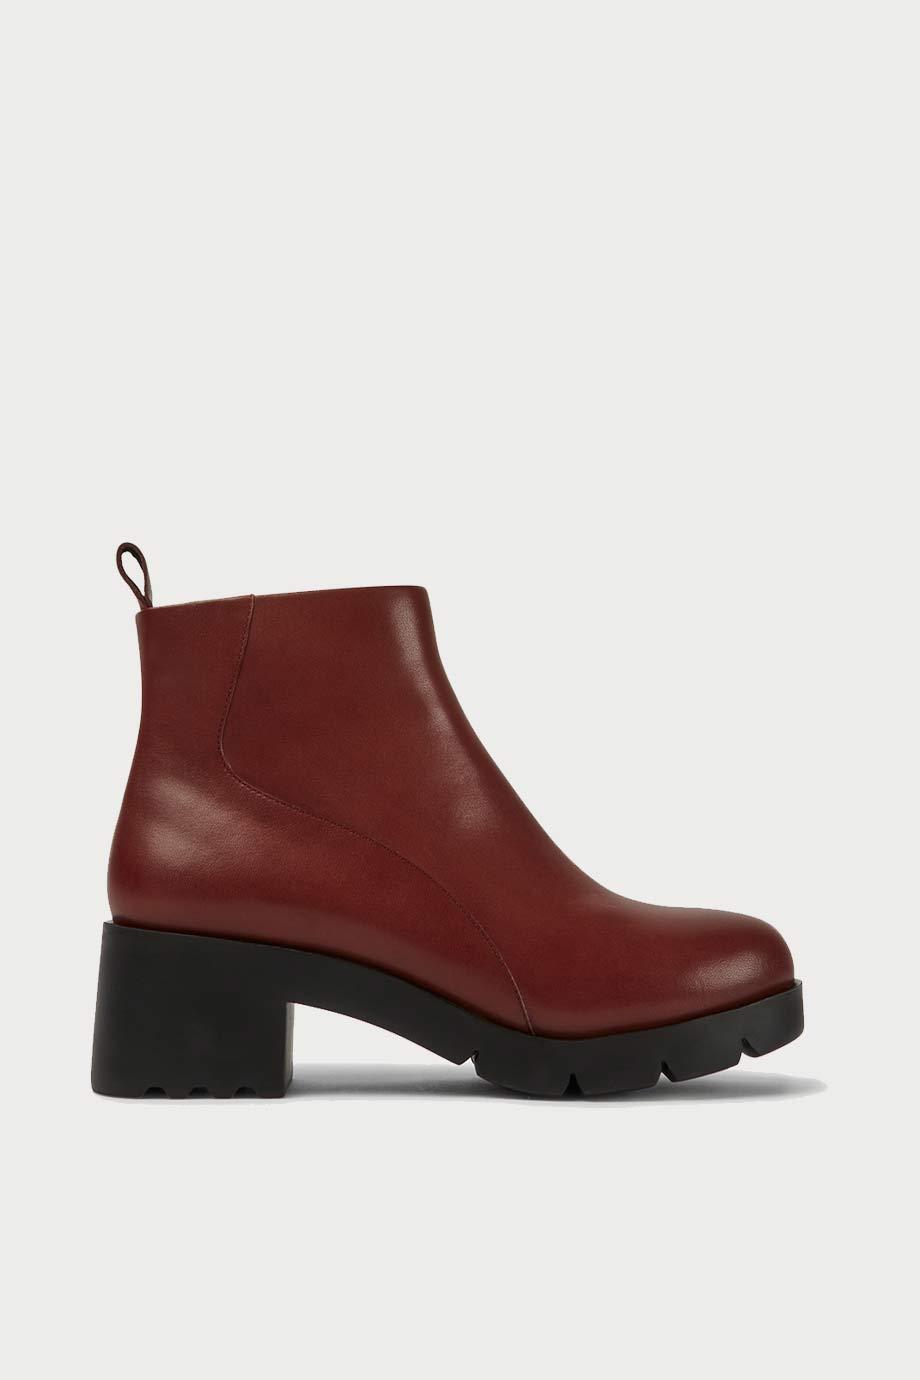 spiridoula metheniti shoes xalkida p K400228 007 camper